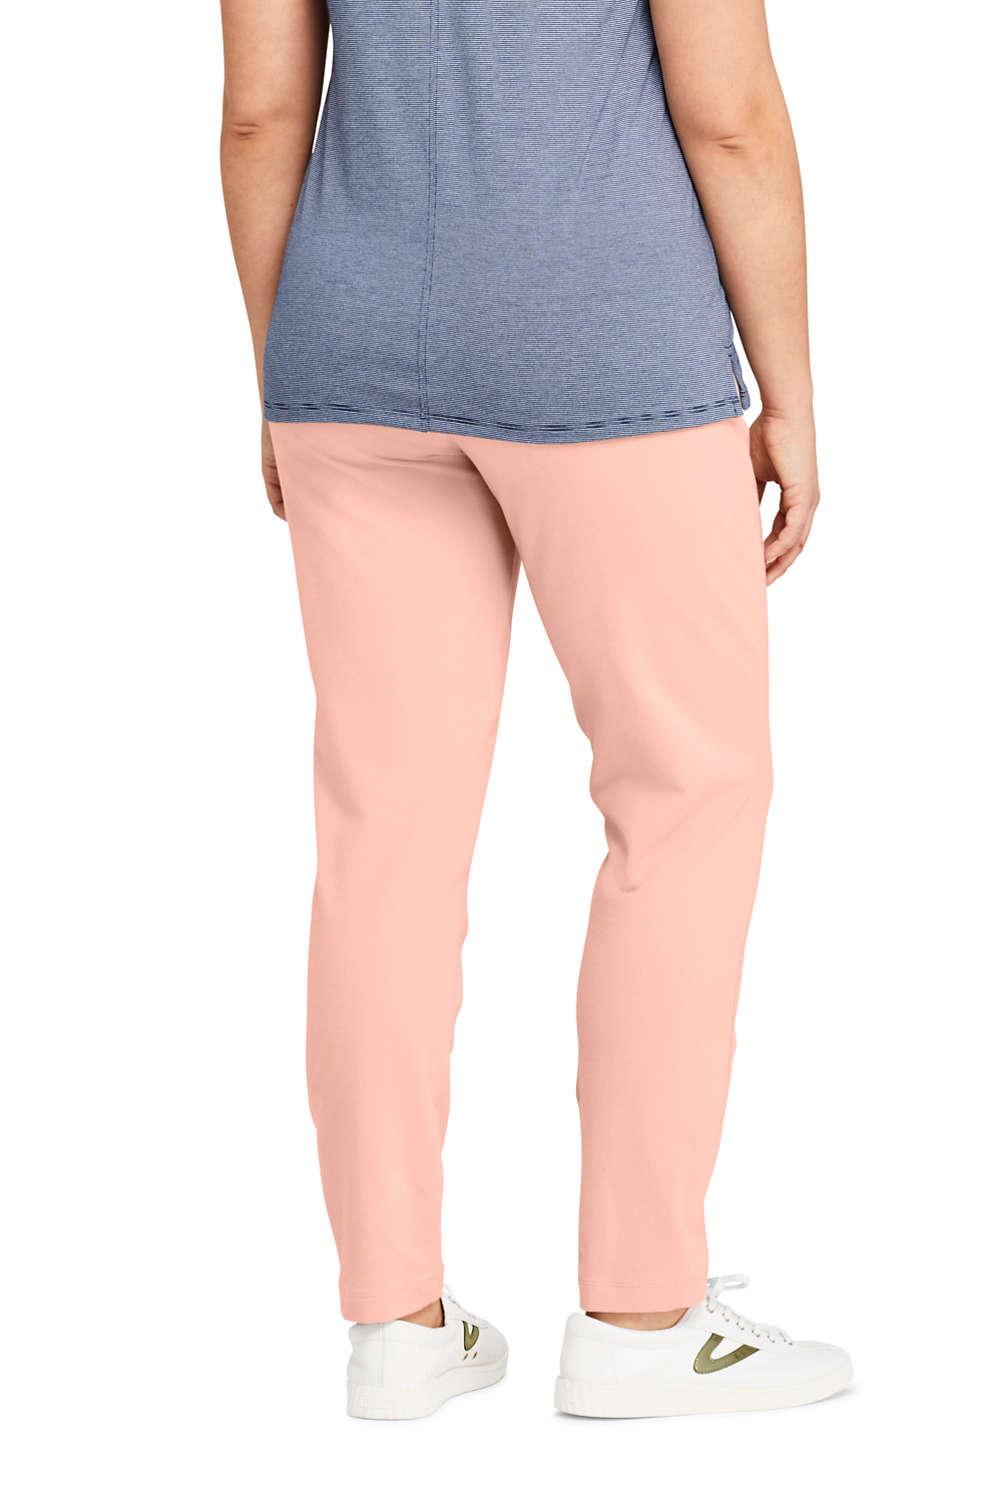 e5b8b64d0bf Women s Plus Size Starfish Knit Jogger Pants. Item  508013AH8. View  Fullscreen